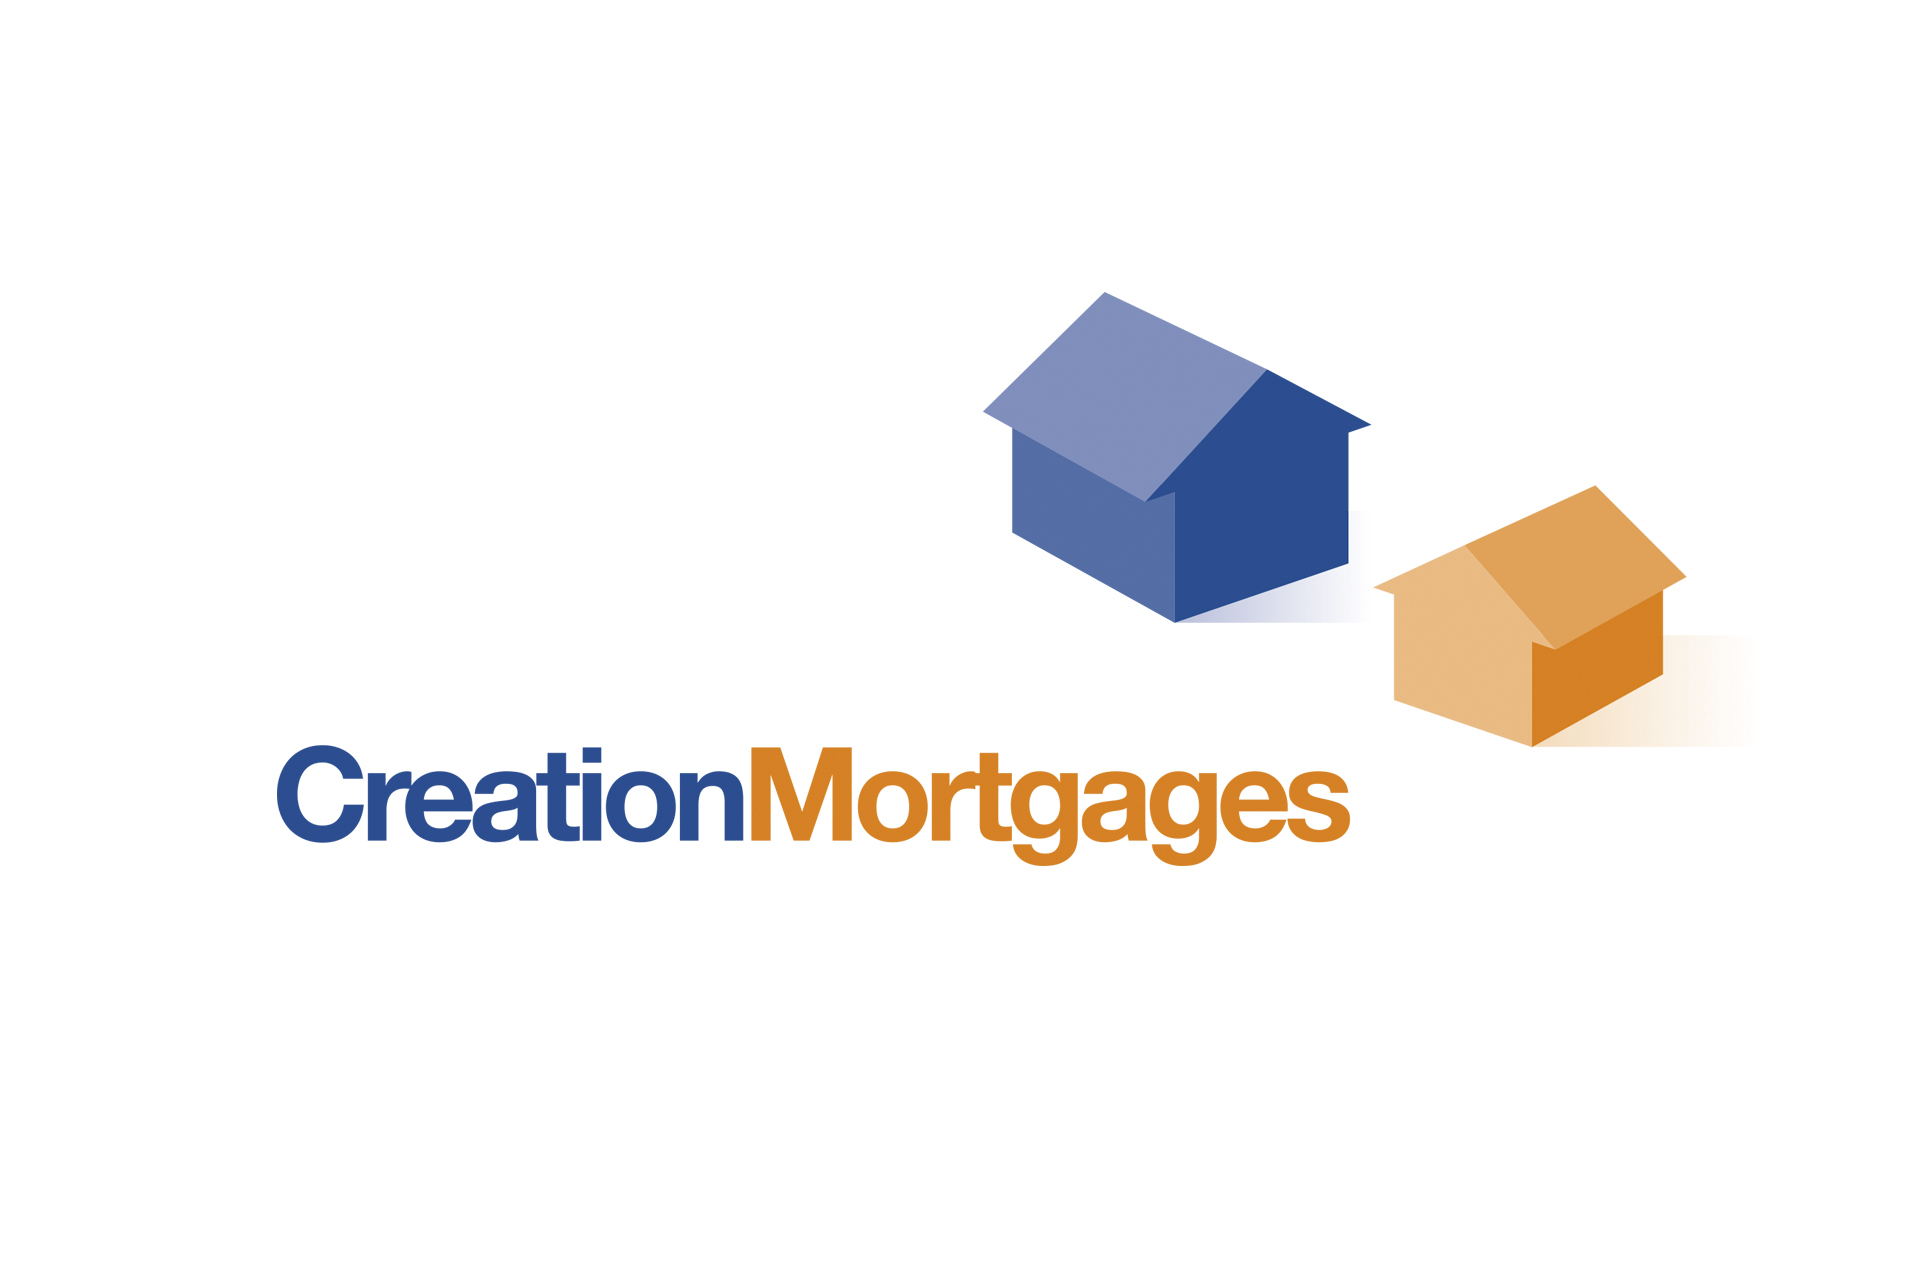 creation-mortgages4_richardbudddesign.jpg